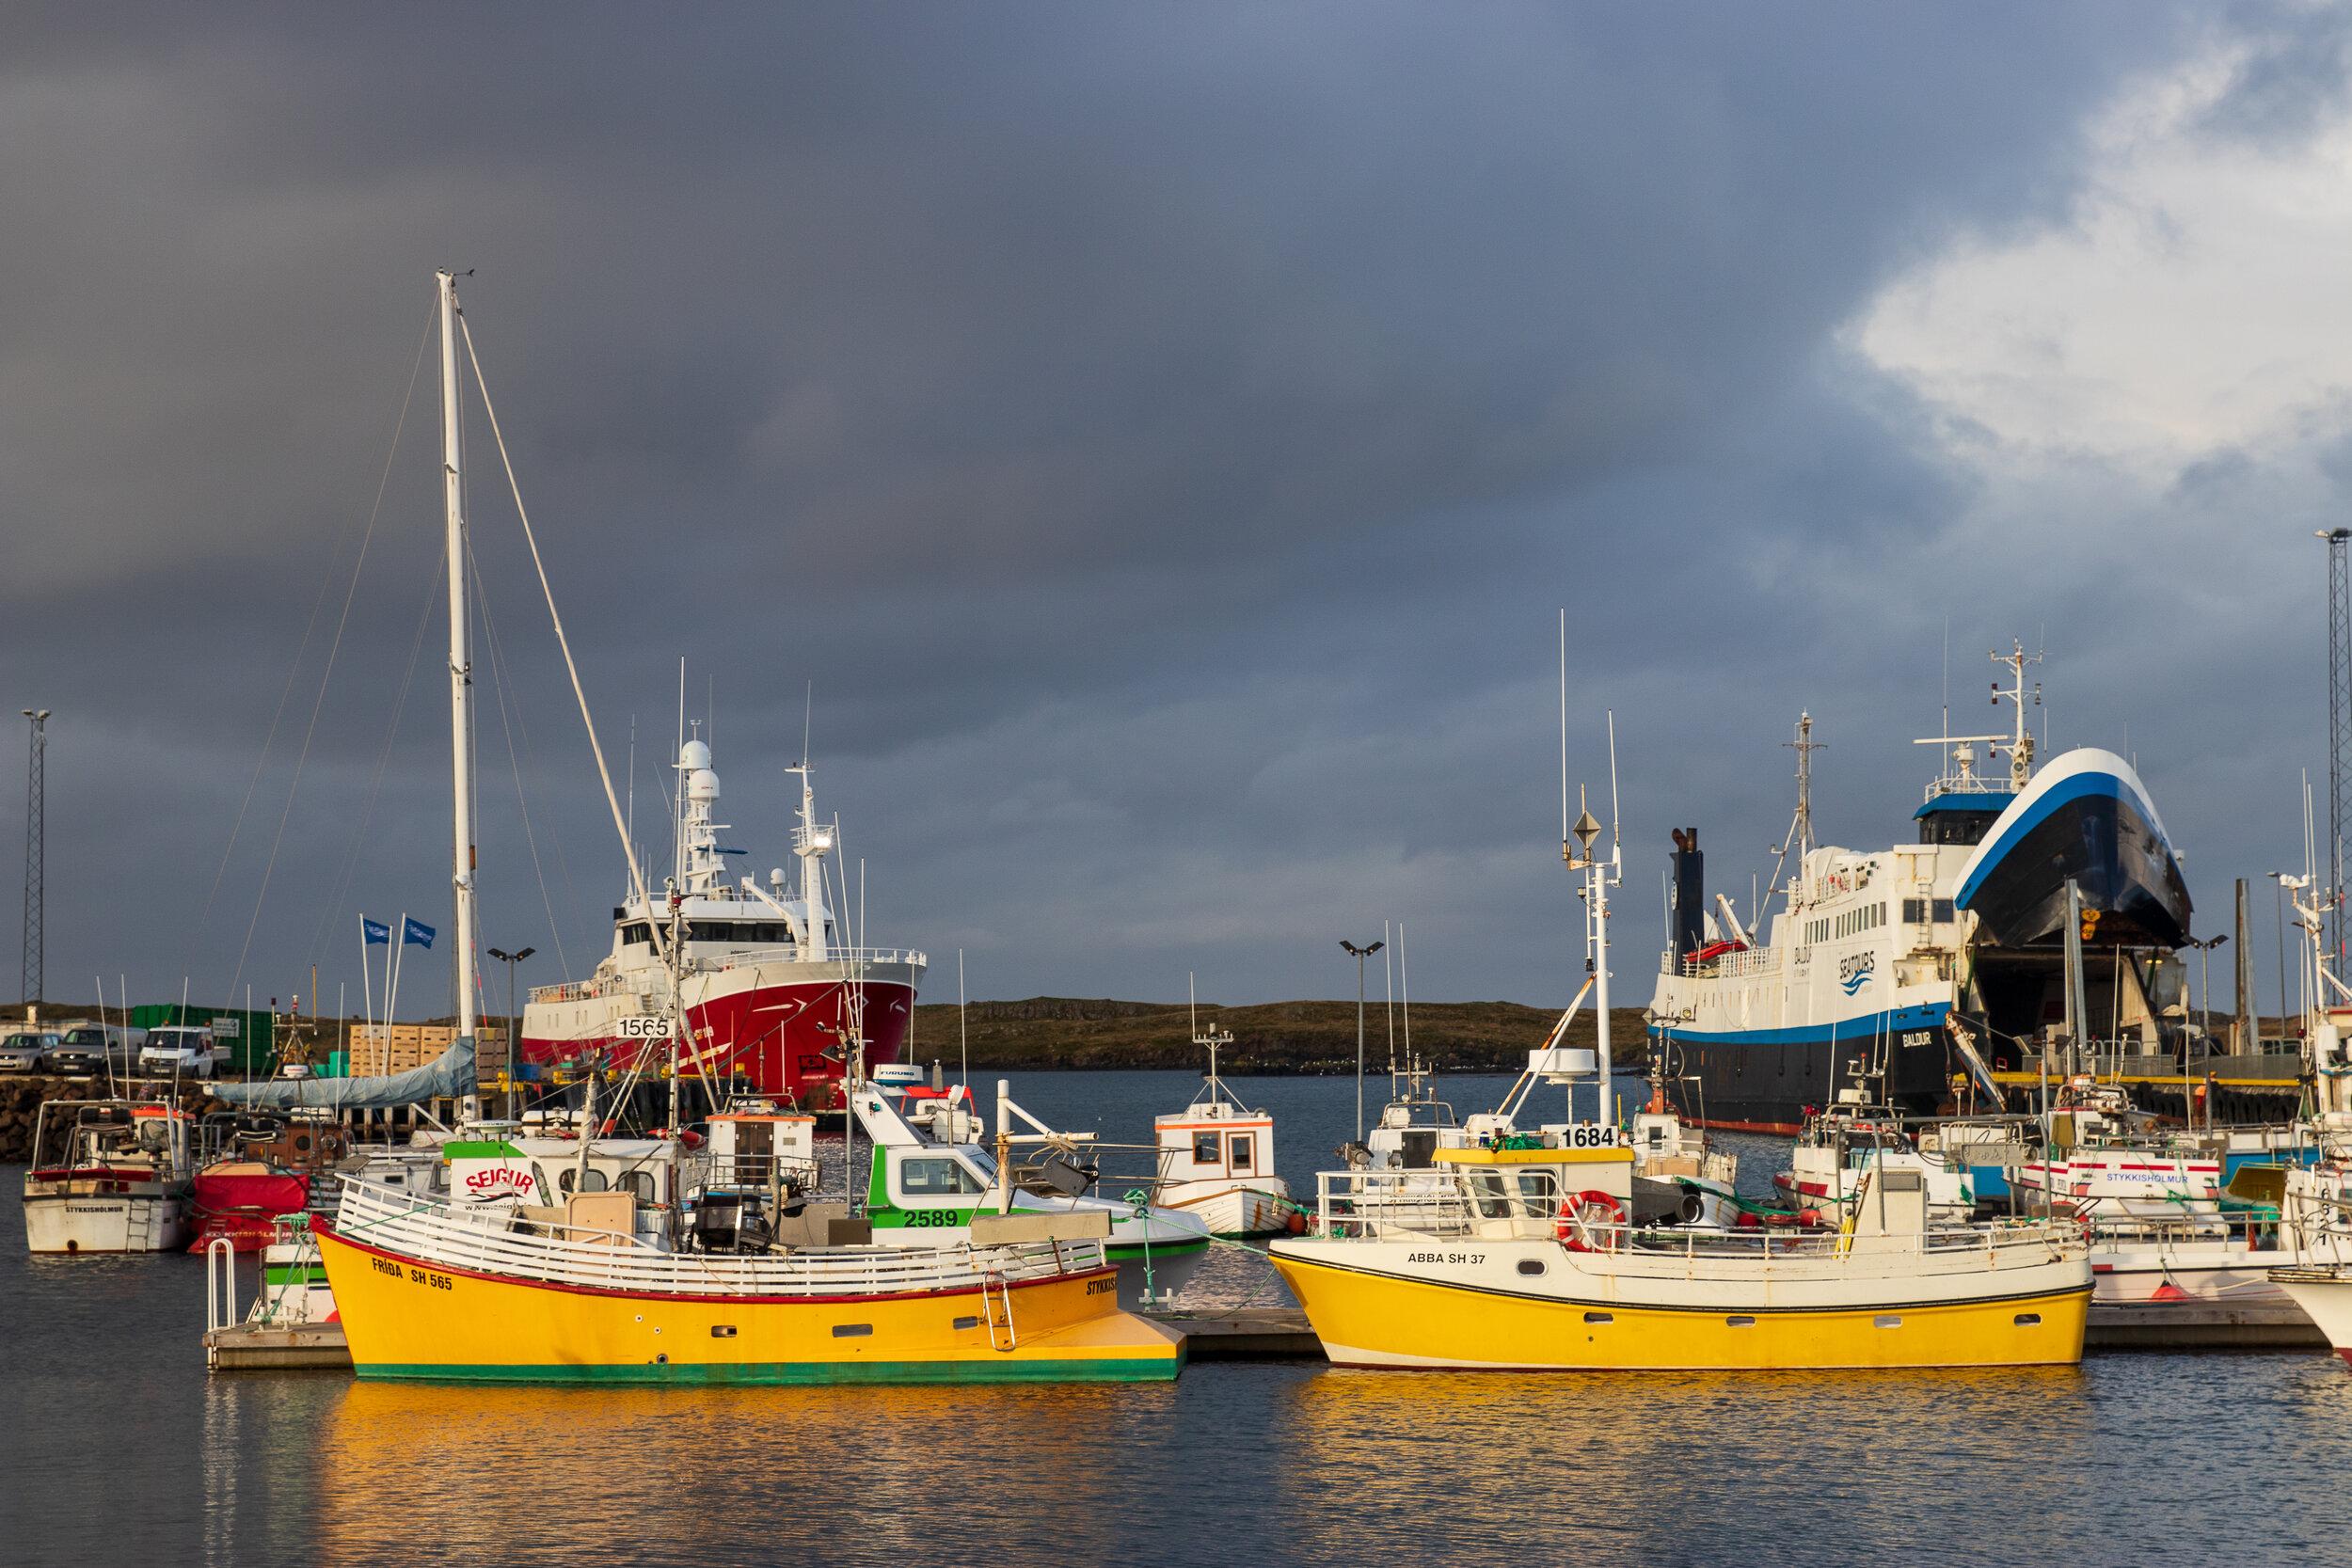 The port of Stykkishólmur.